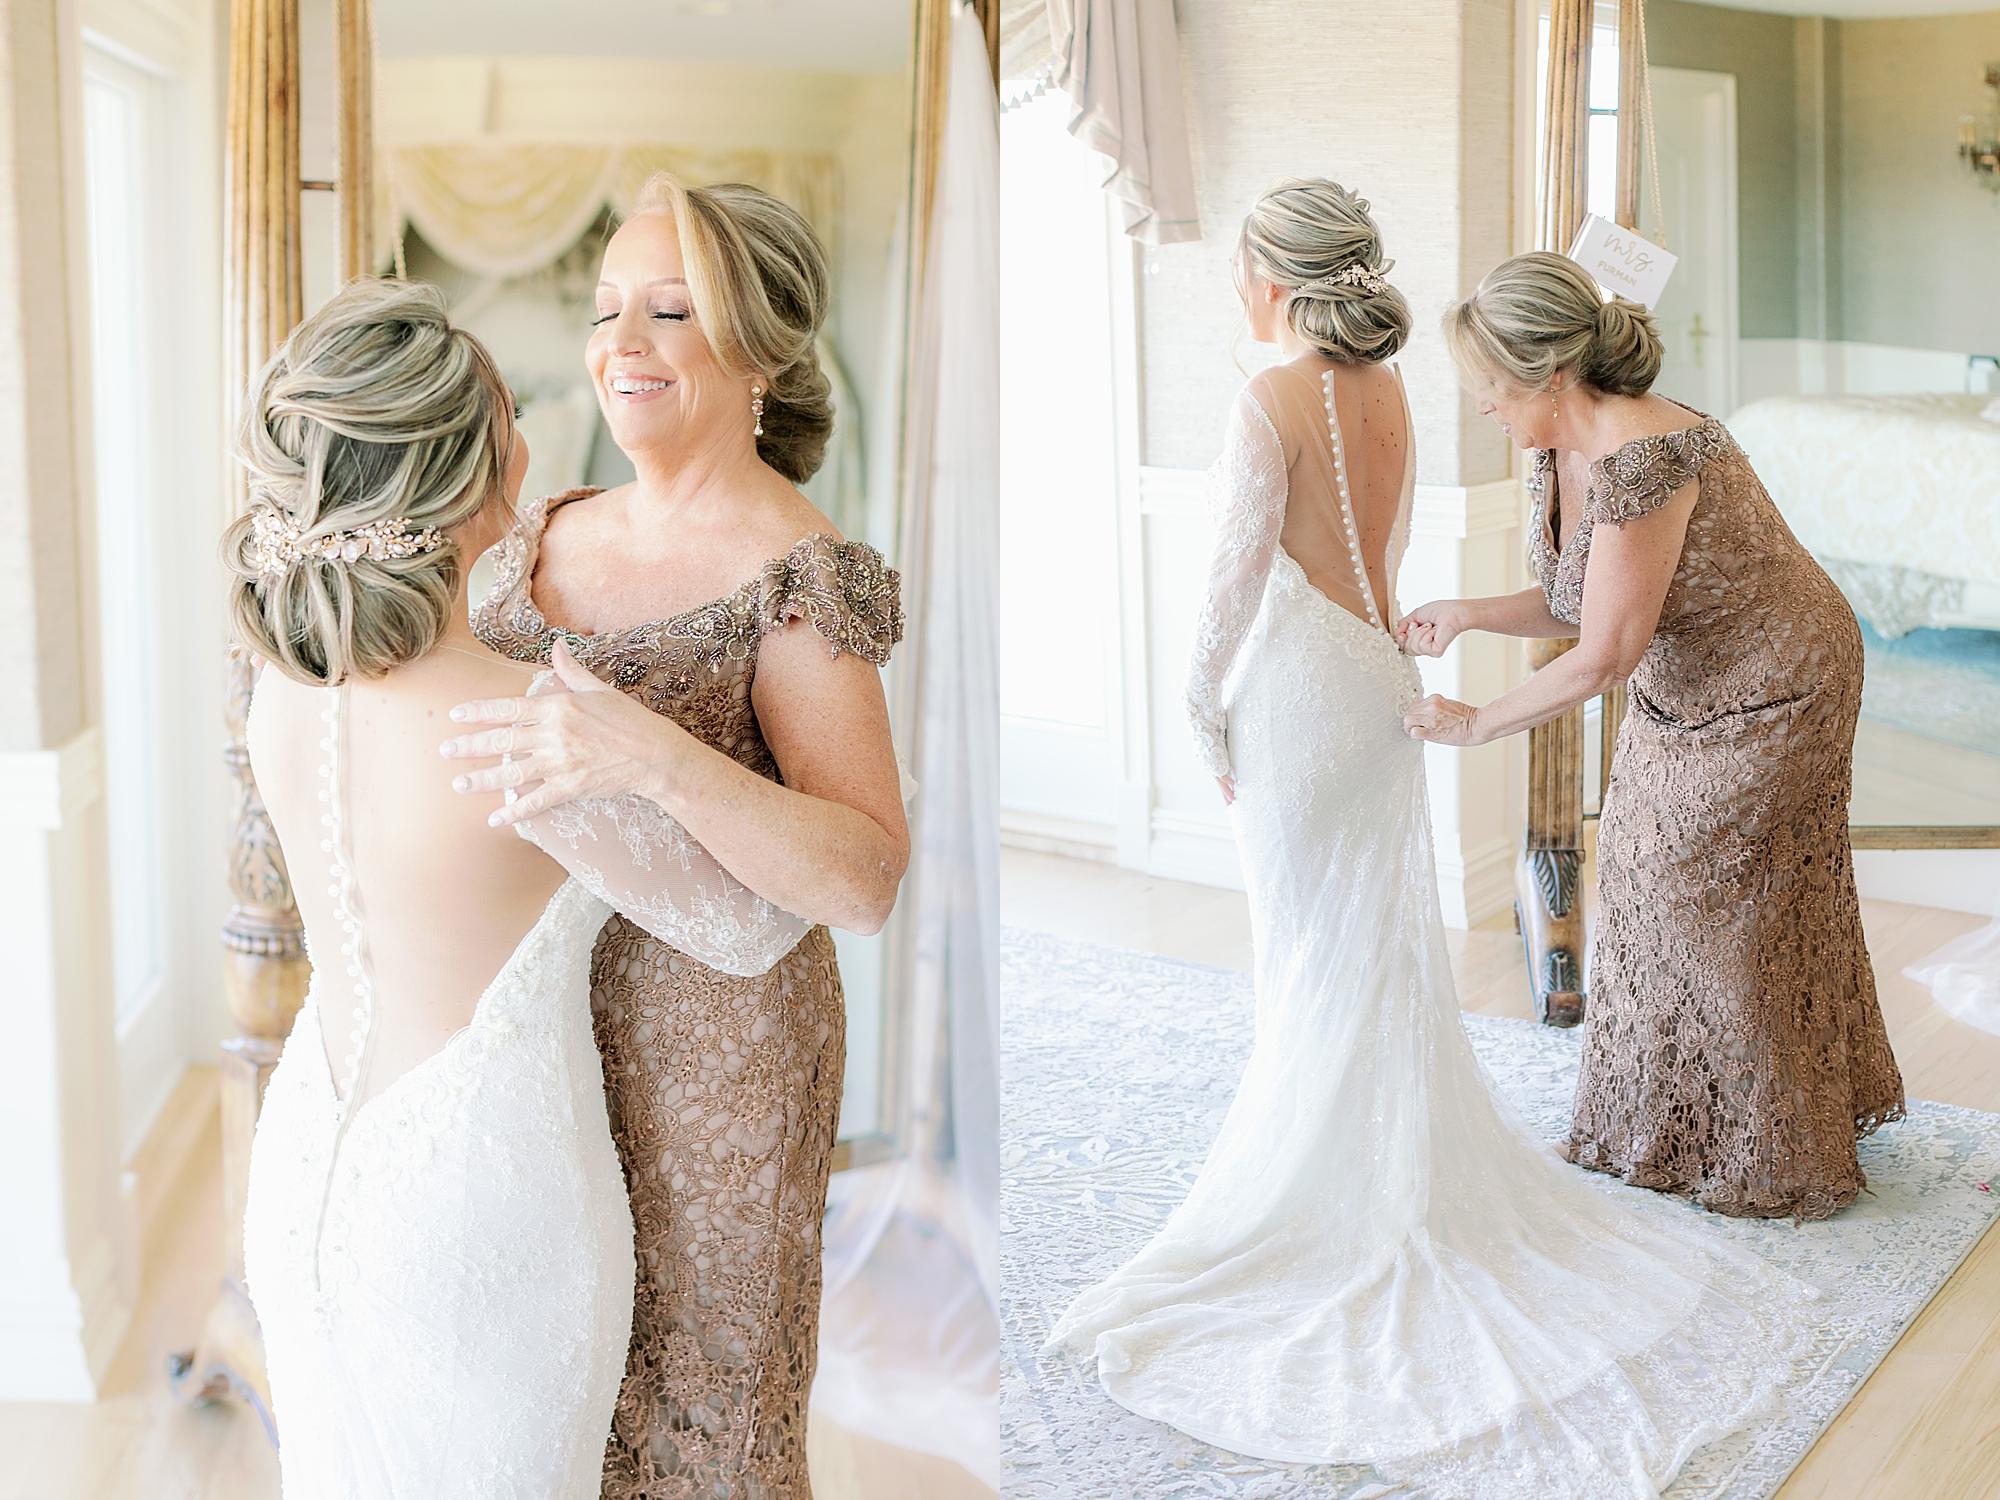 Bonnet Island Estate Film Wedding Photography by Magdalena Studios 0014